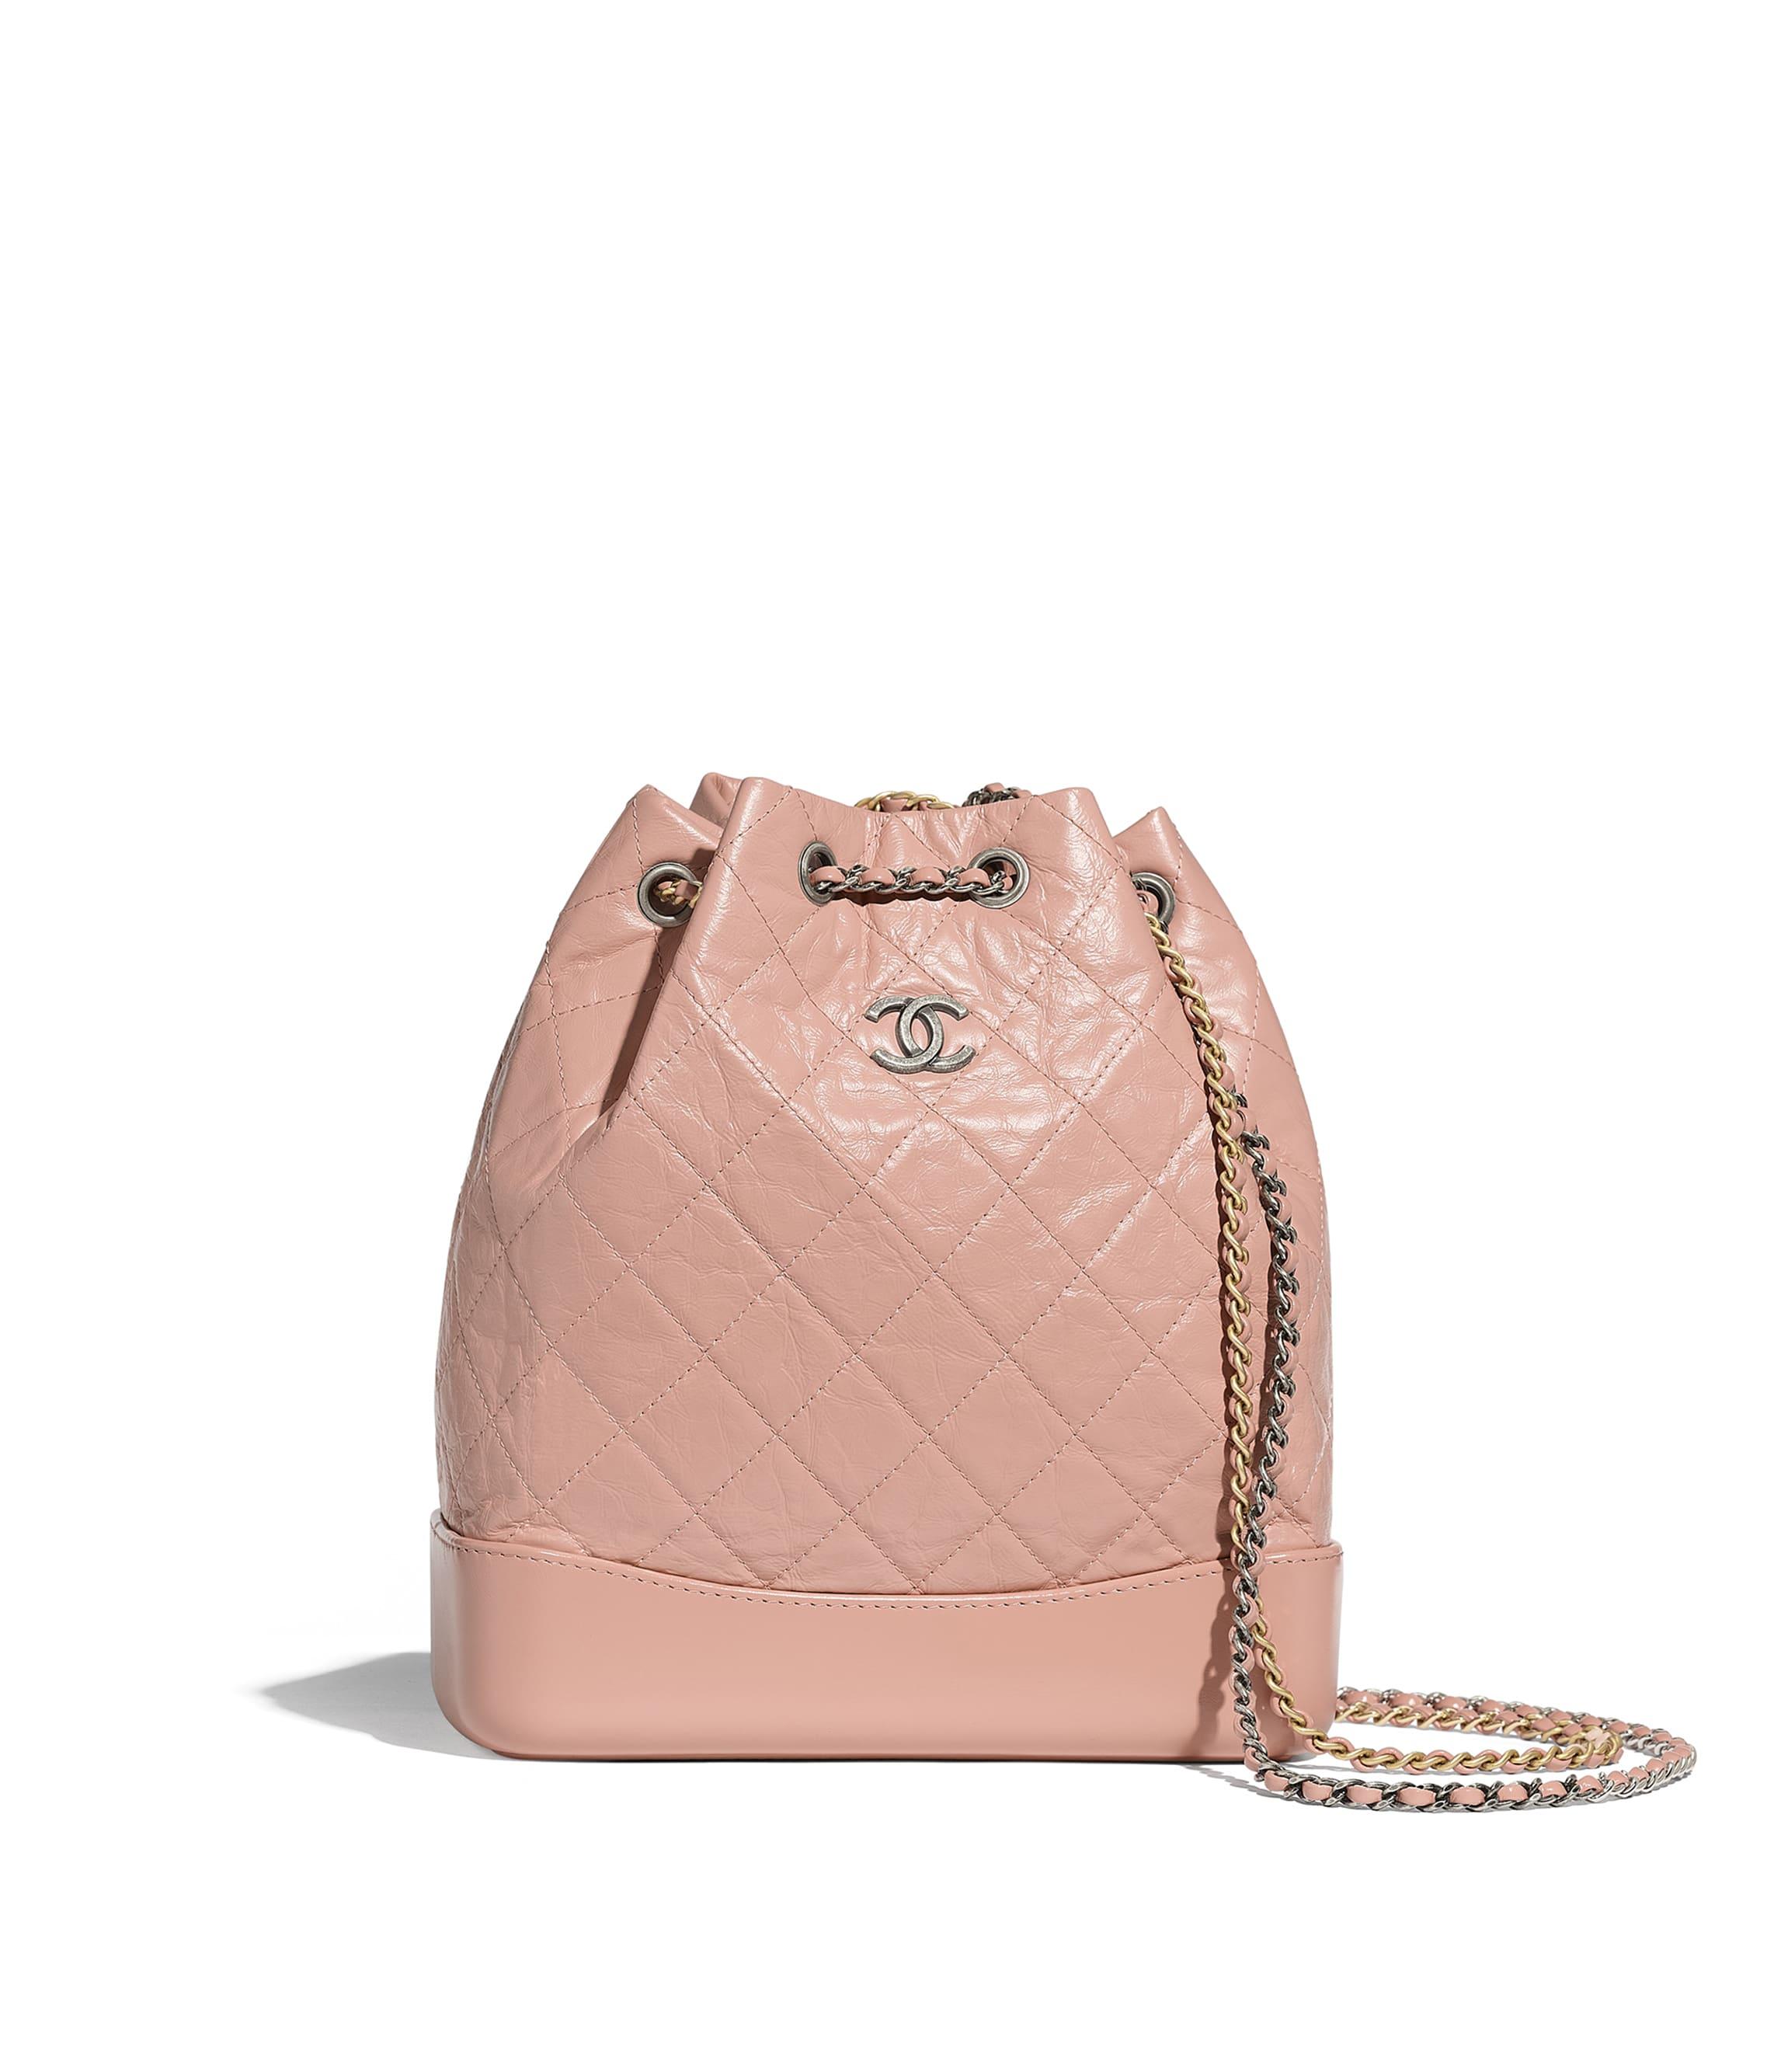 48c667953578 Spring-Summer 2019 Pre-Collection - Handbags - CHANEL